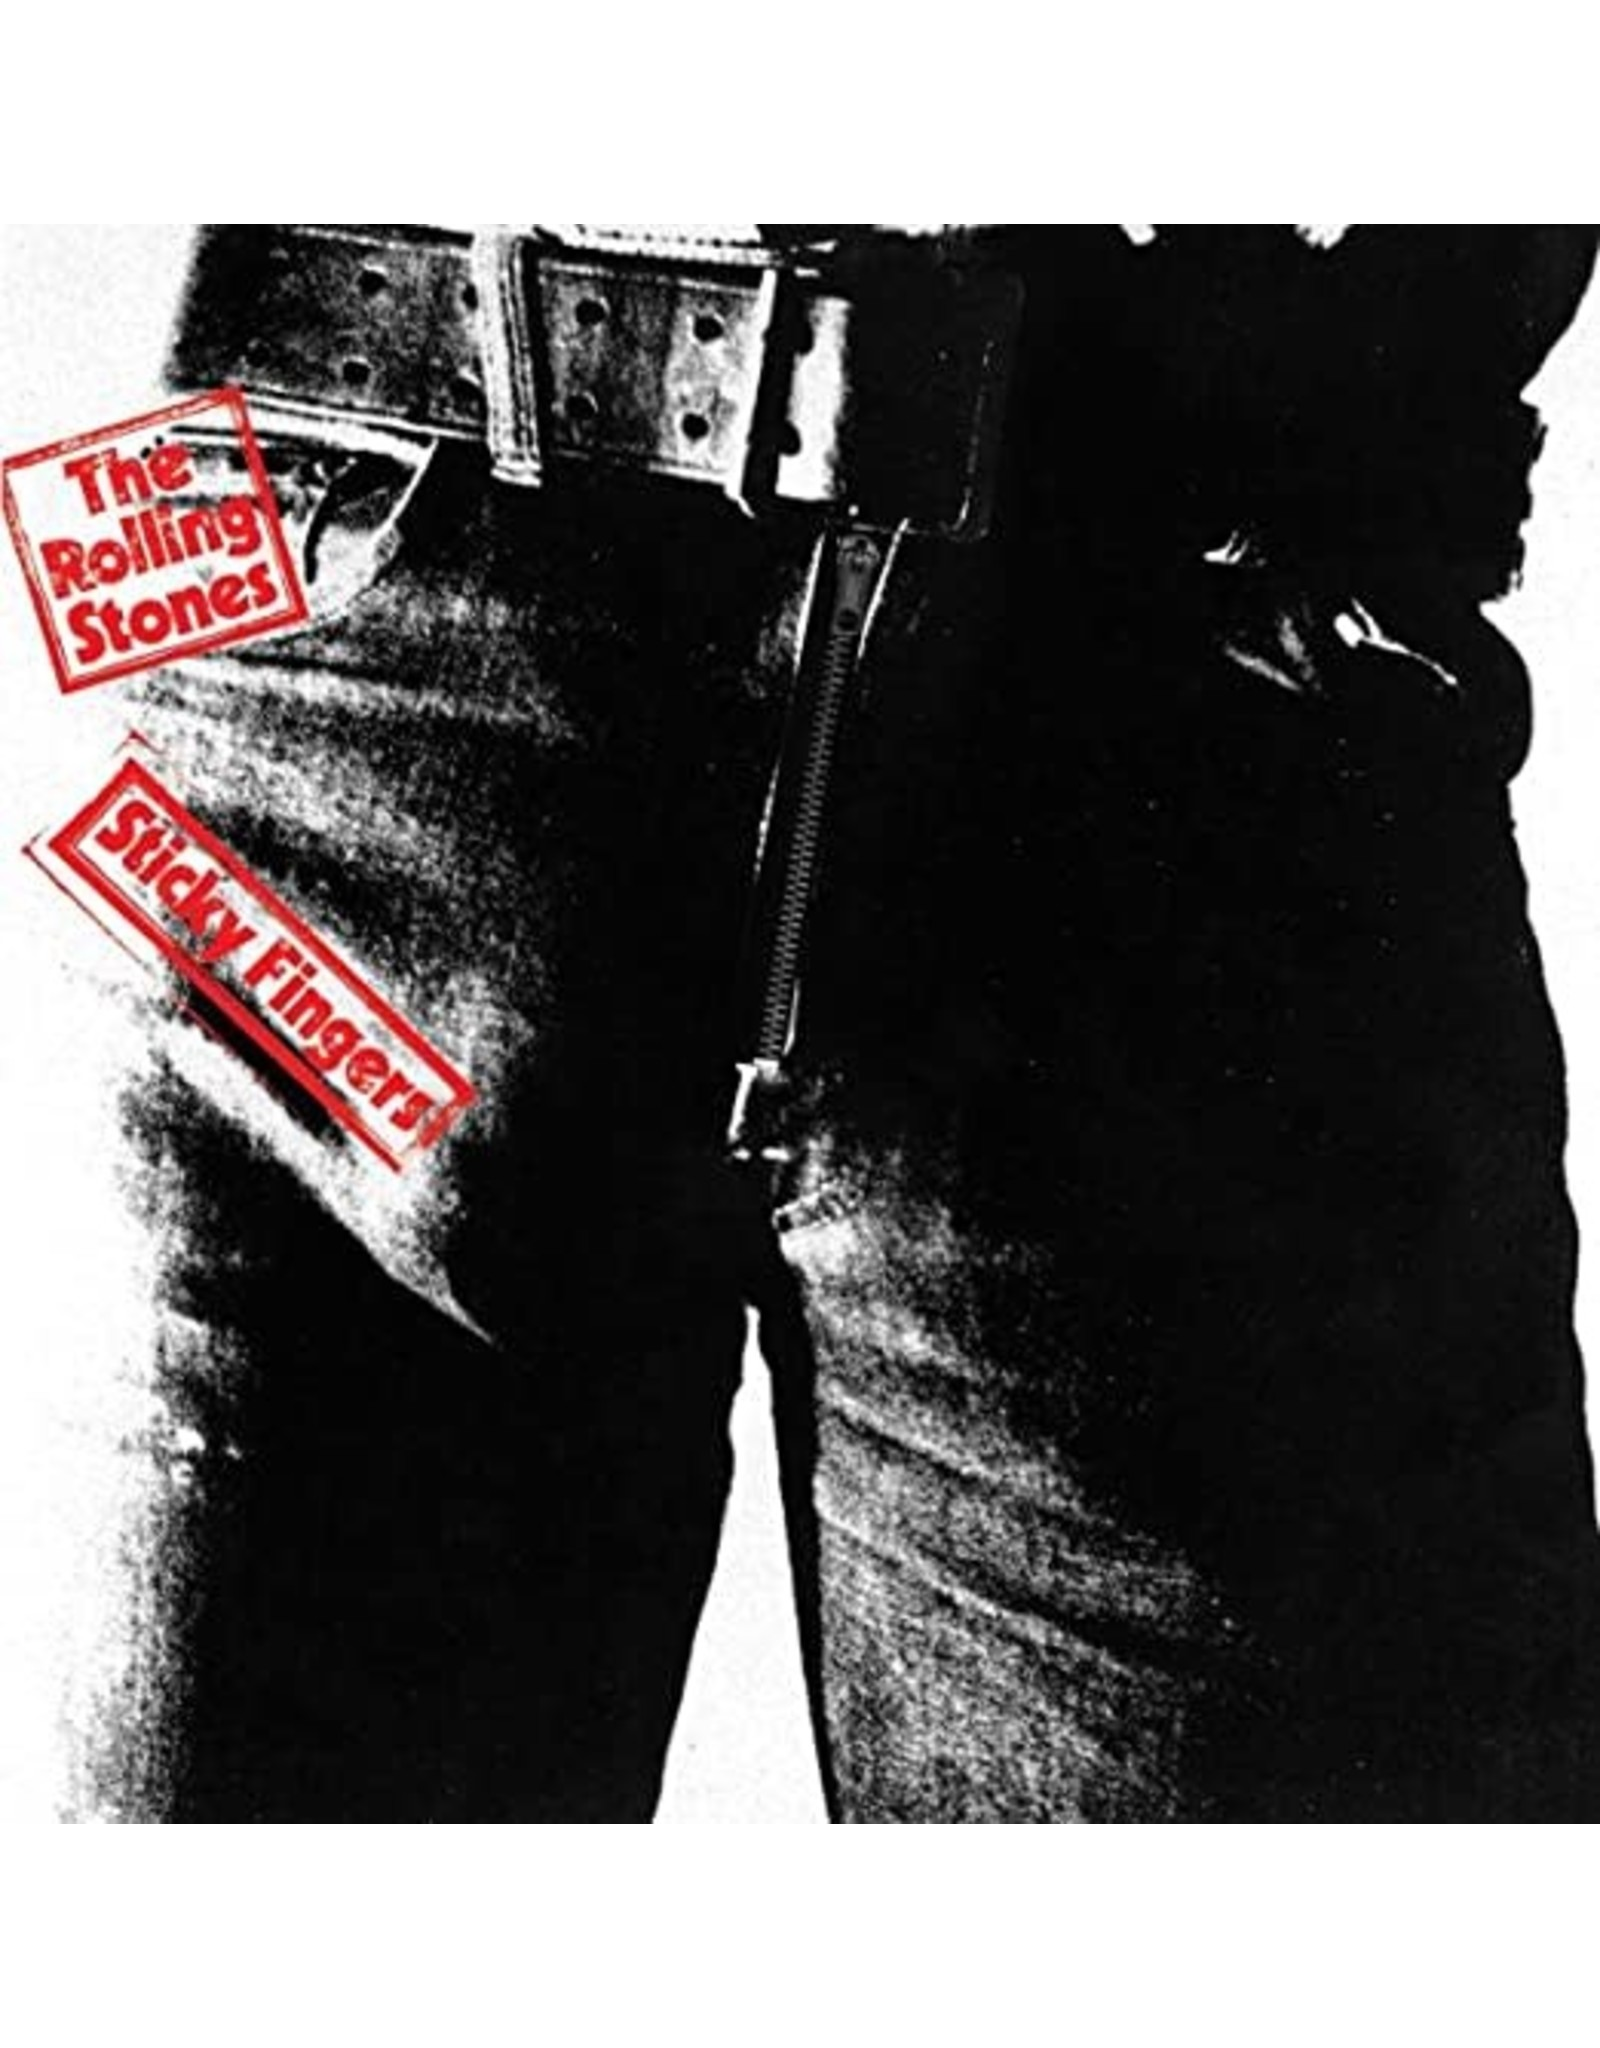 Rolling Stones - Sticky Fingers (Half-Speed) LP